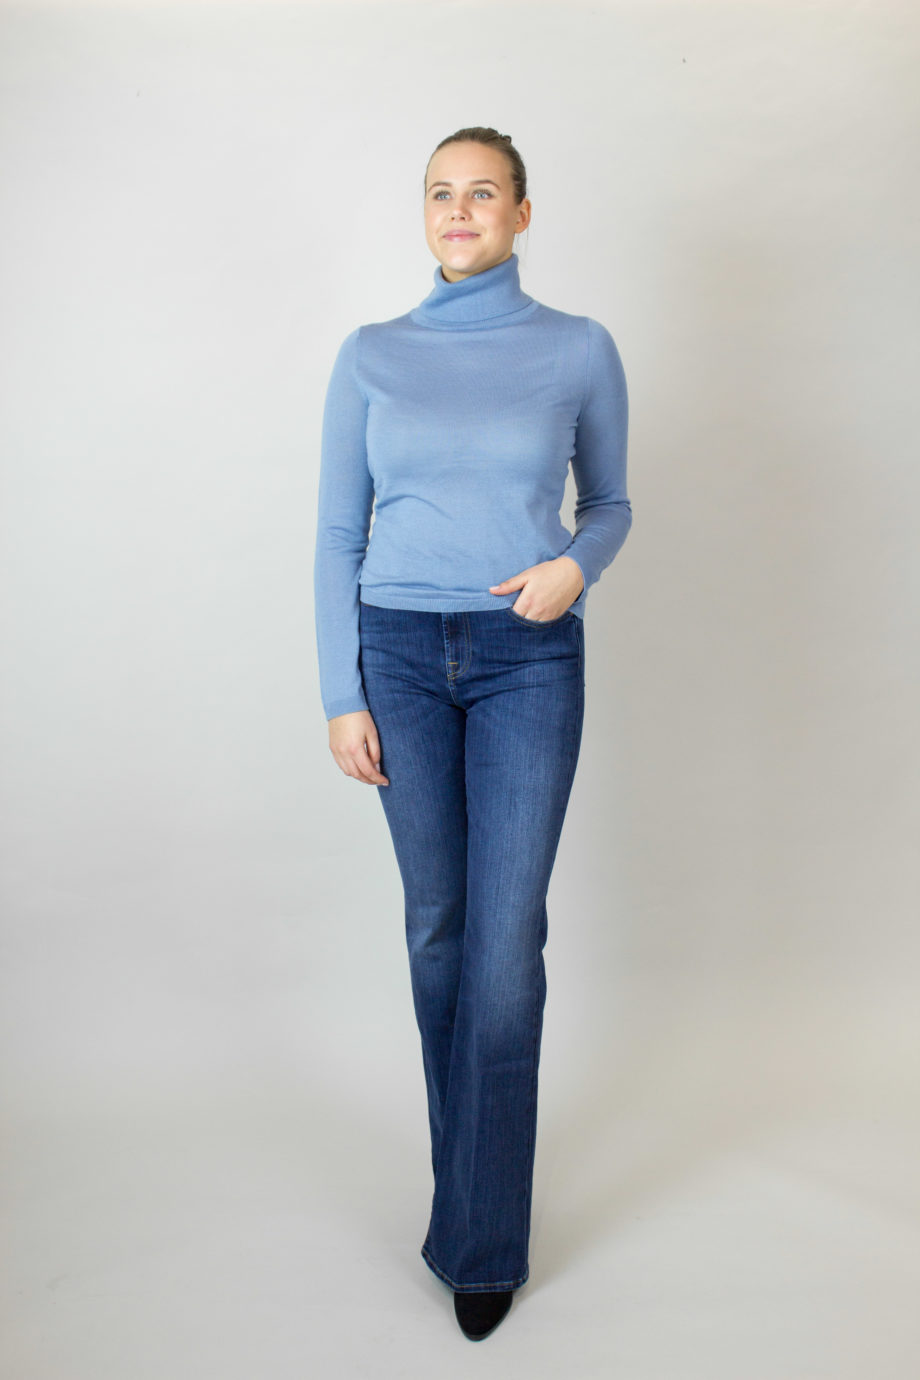 FTC Blue Shadow polo sweater